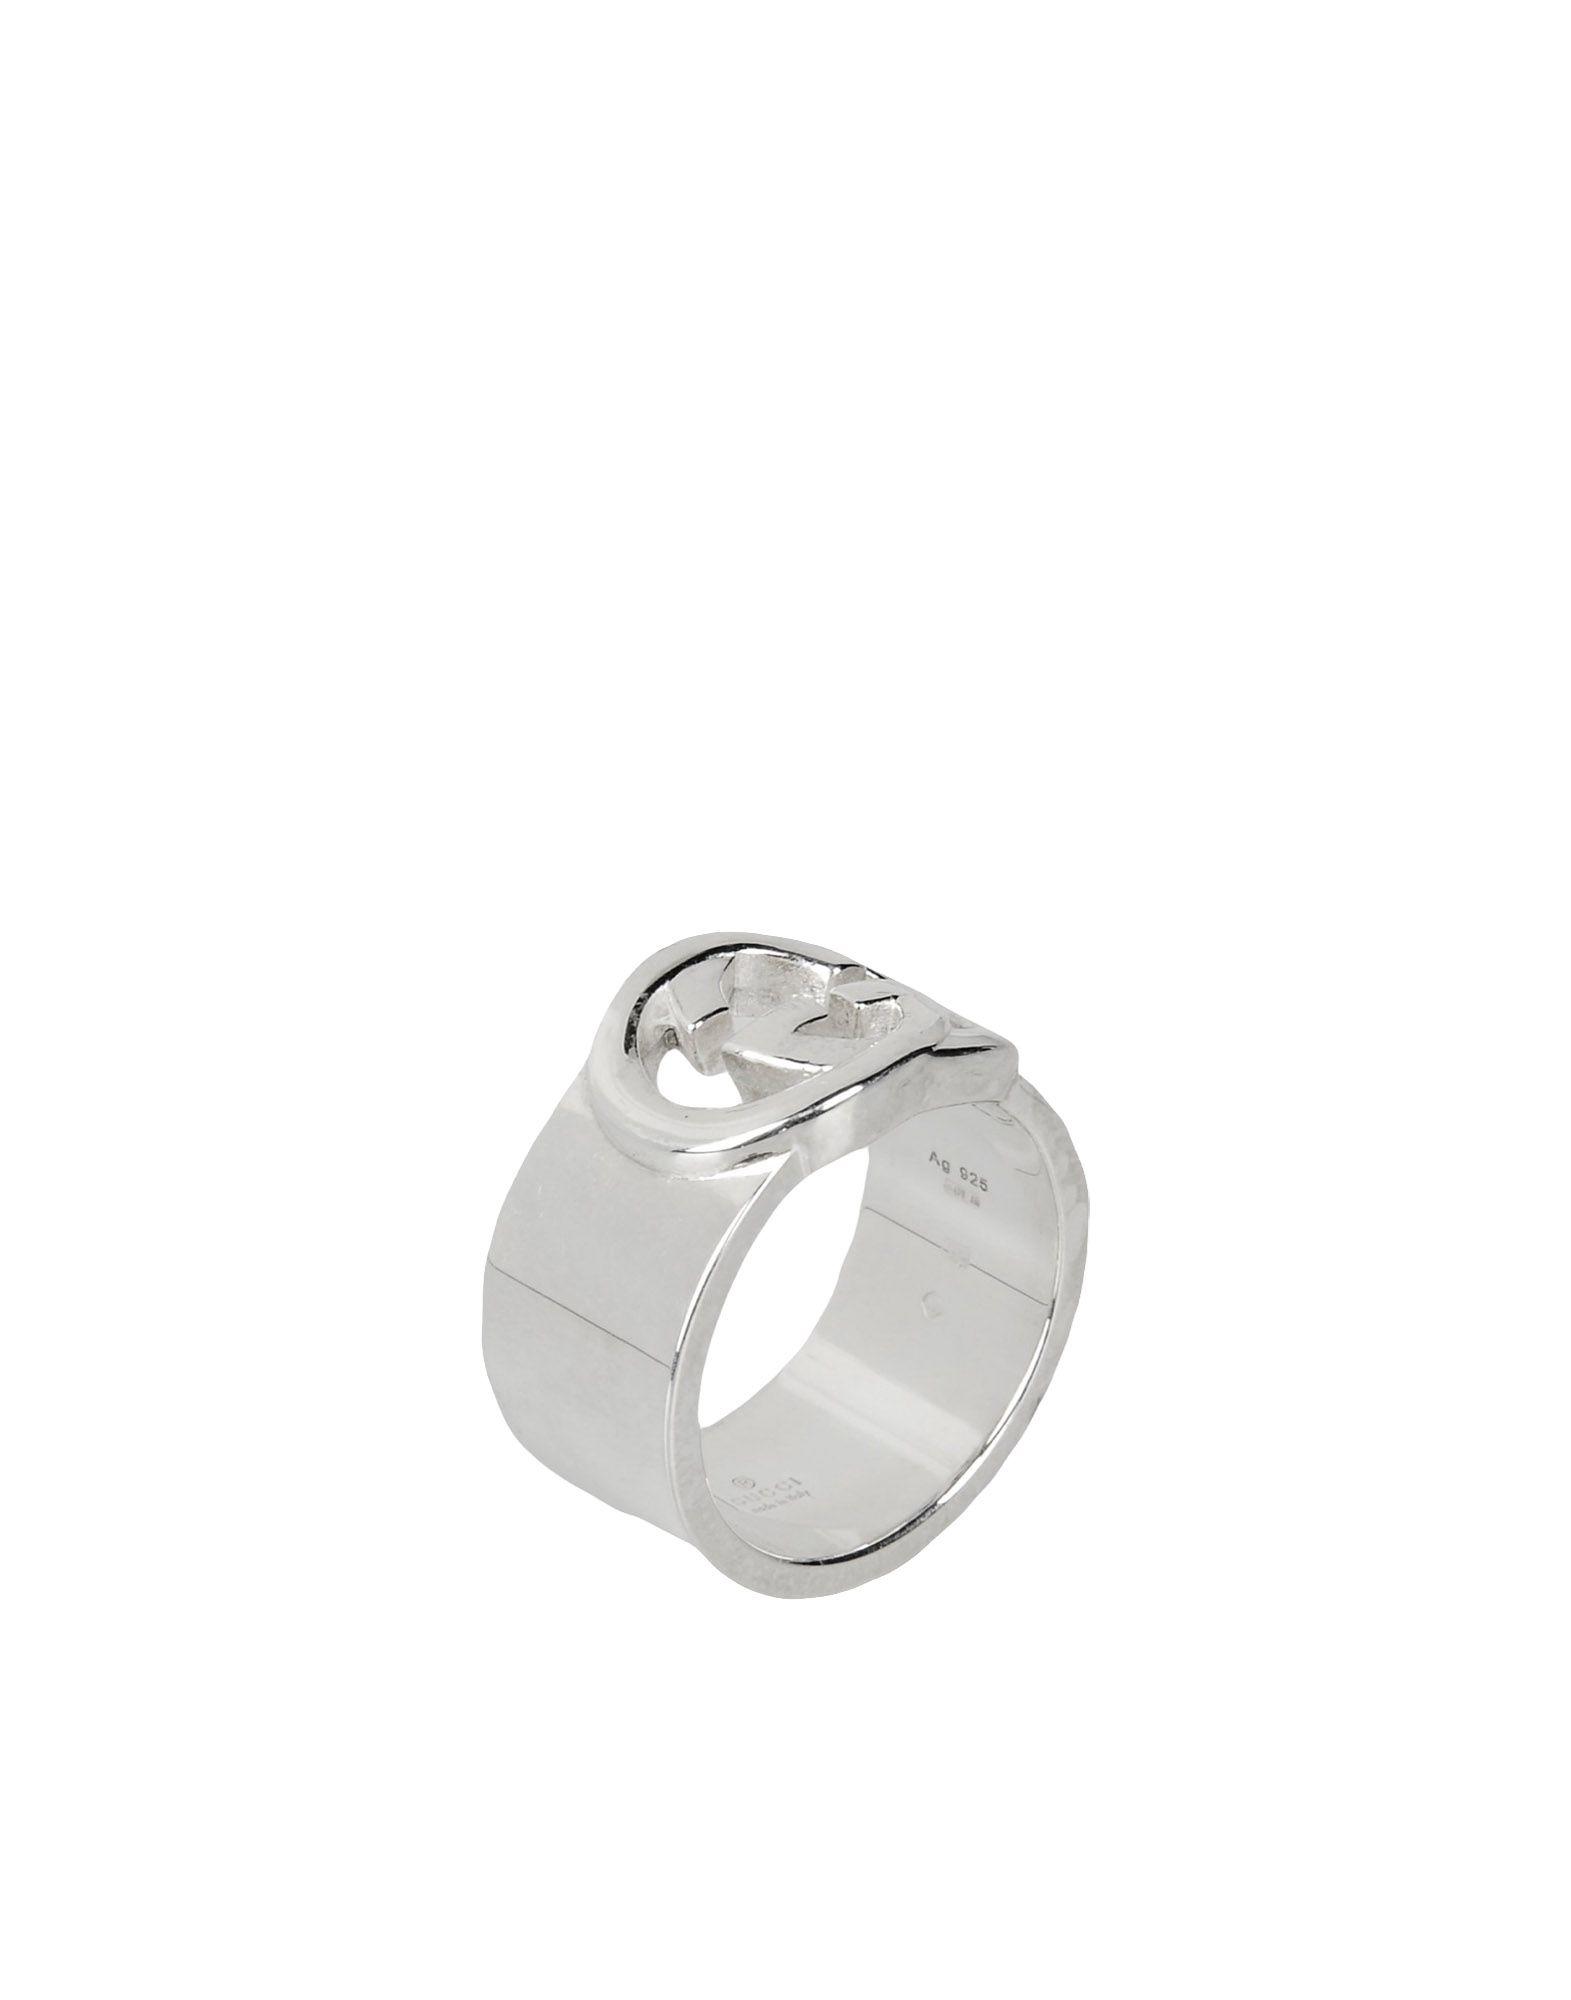 25f13b59a902 Lyst - Gucci Ring in Metallic